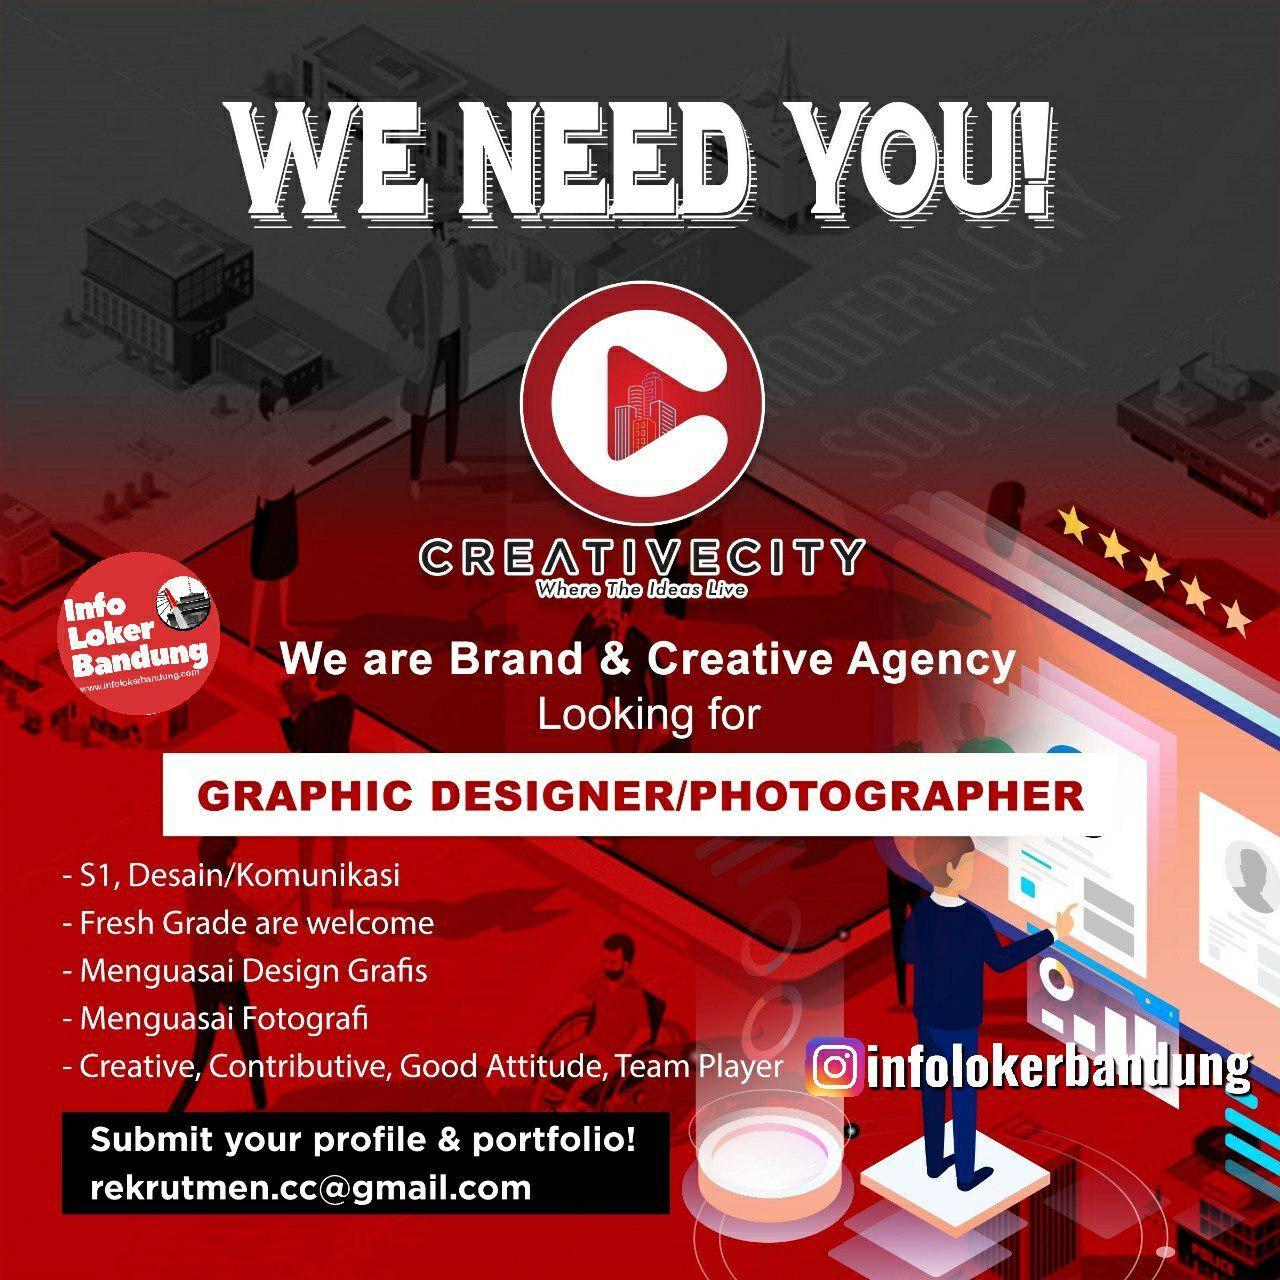 Lowongan Kerja Graphic Designer & Photographer Creative City Bandung Januari 2020